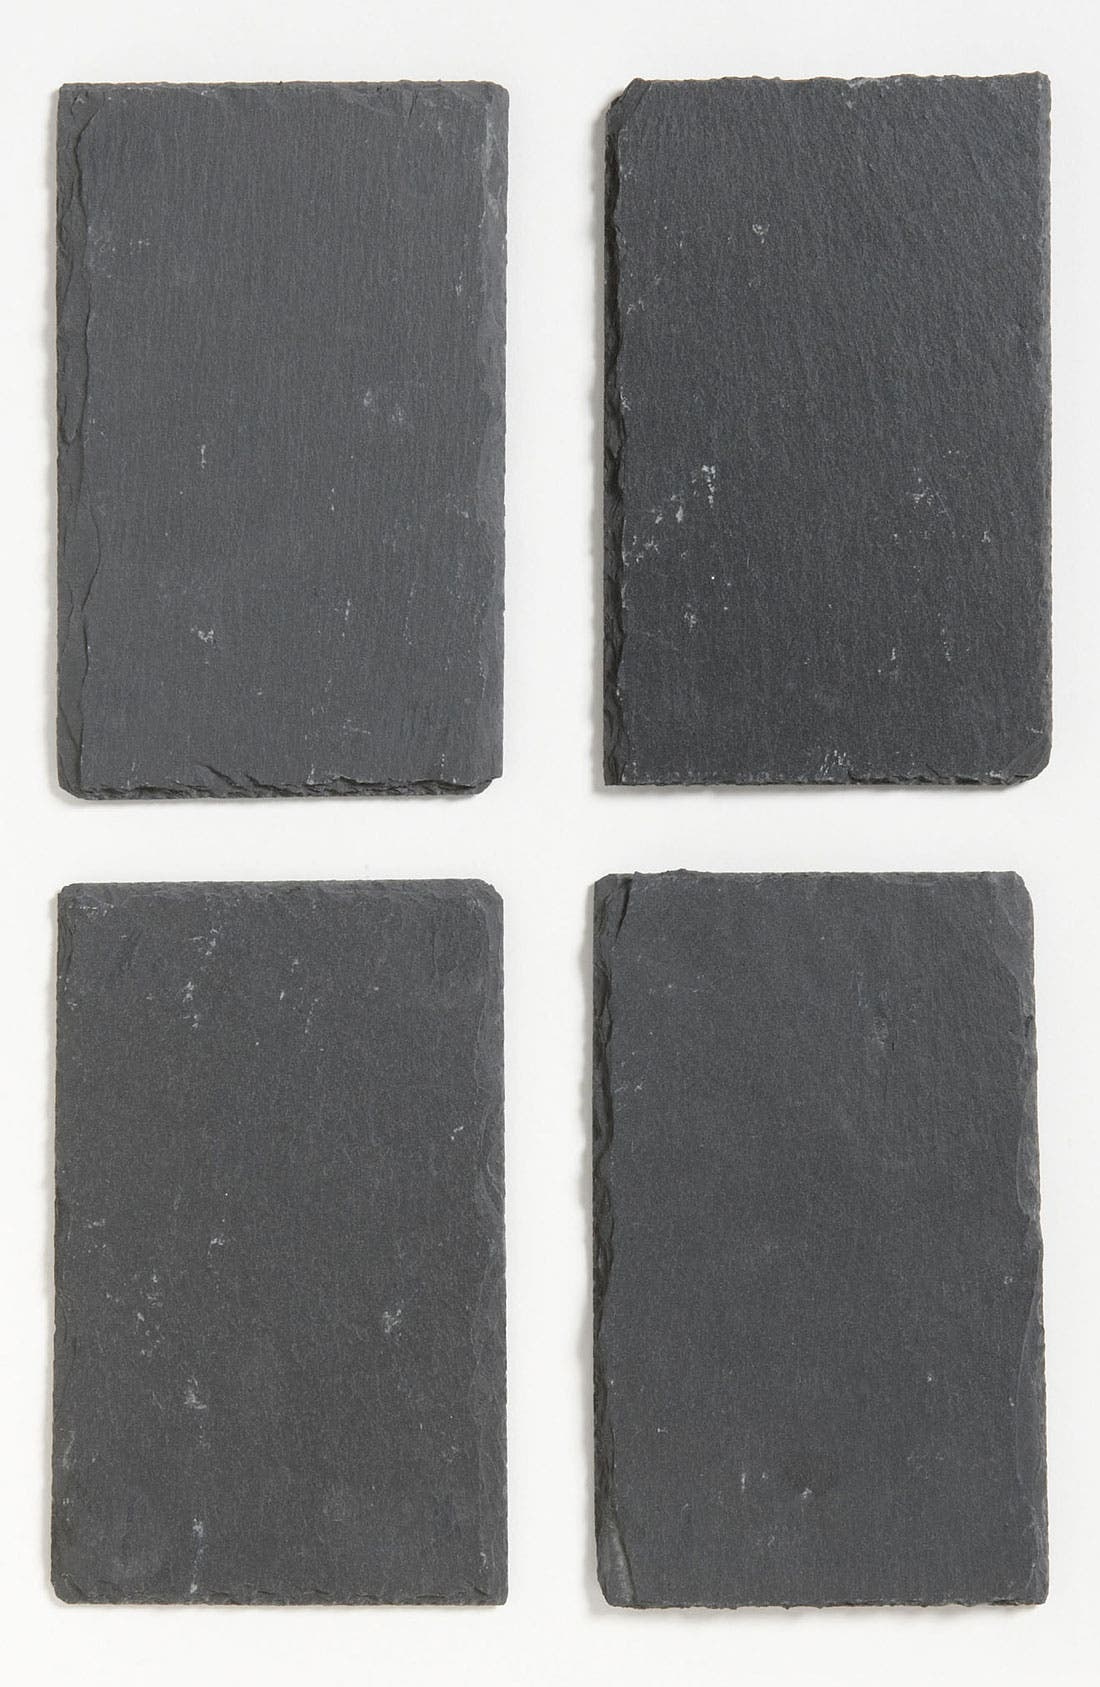 Alternate Image 1 Selected - 'Monaco' Slate Cheese Boards (Set of 4)